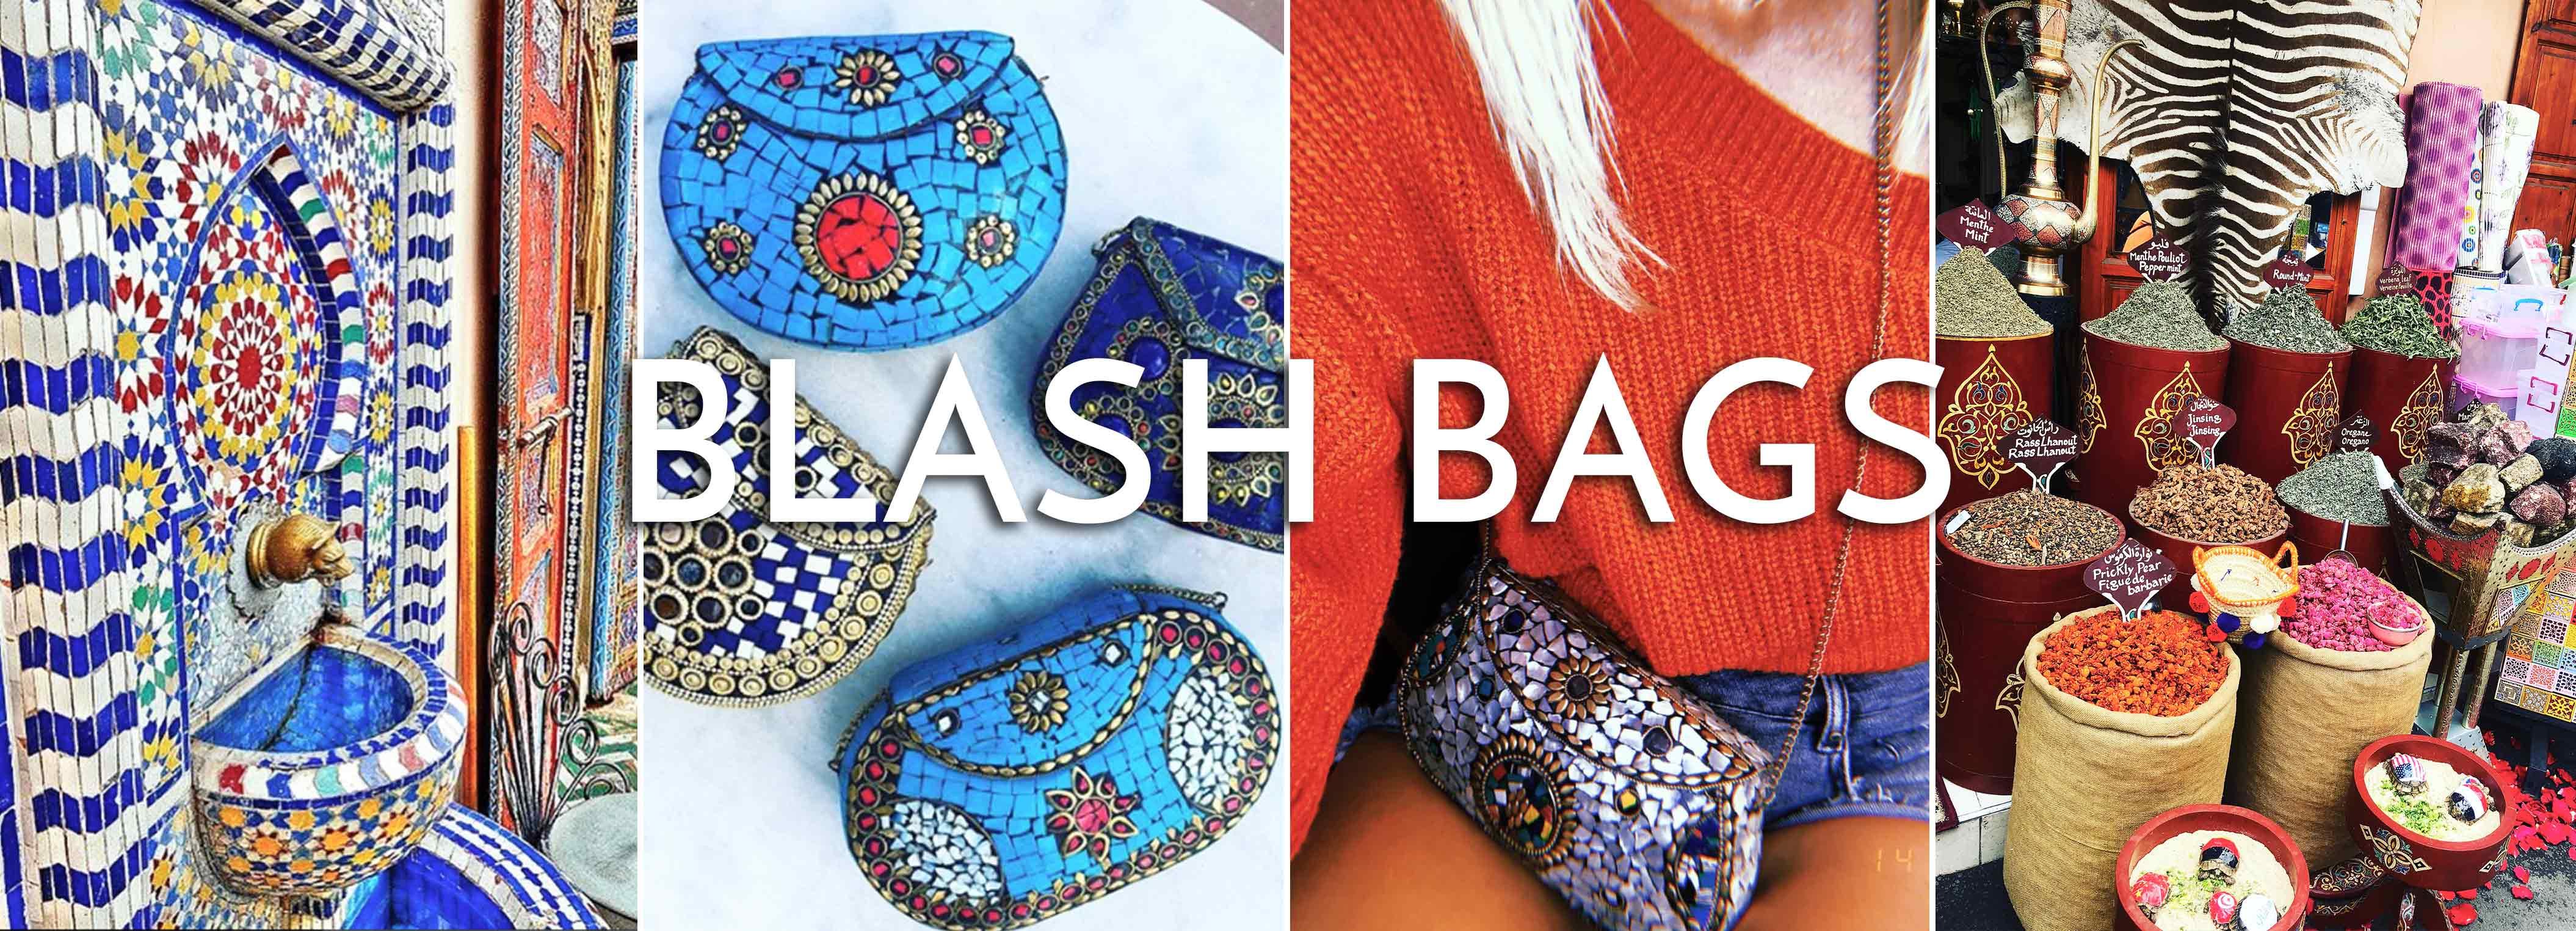 Blash bags